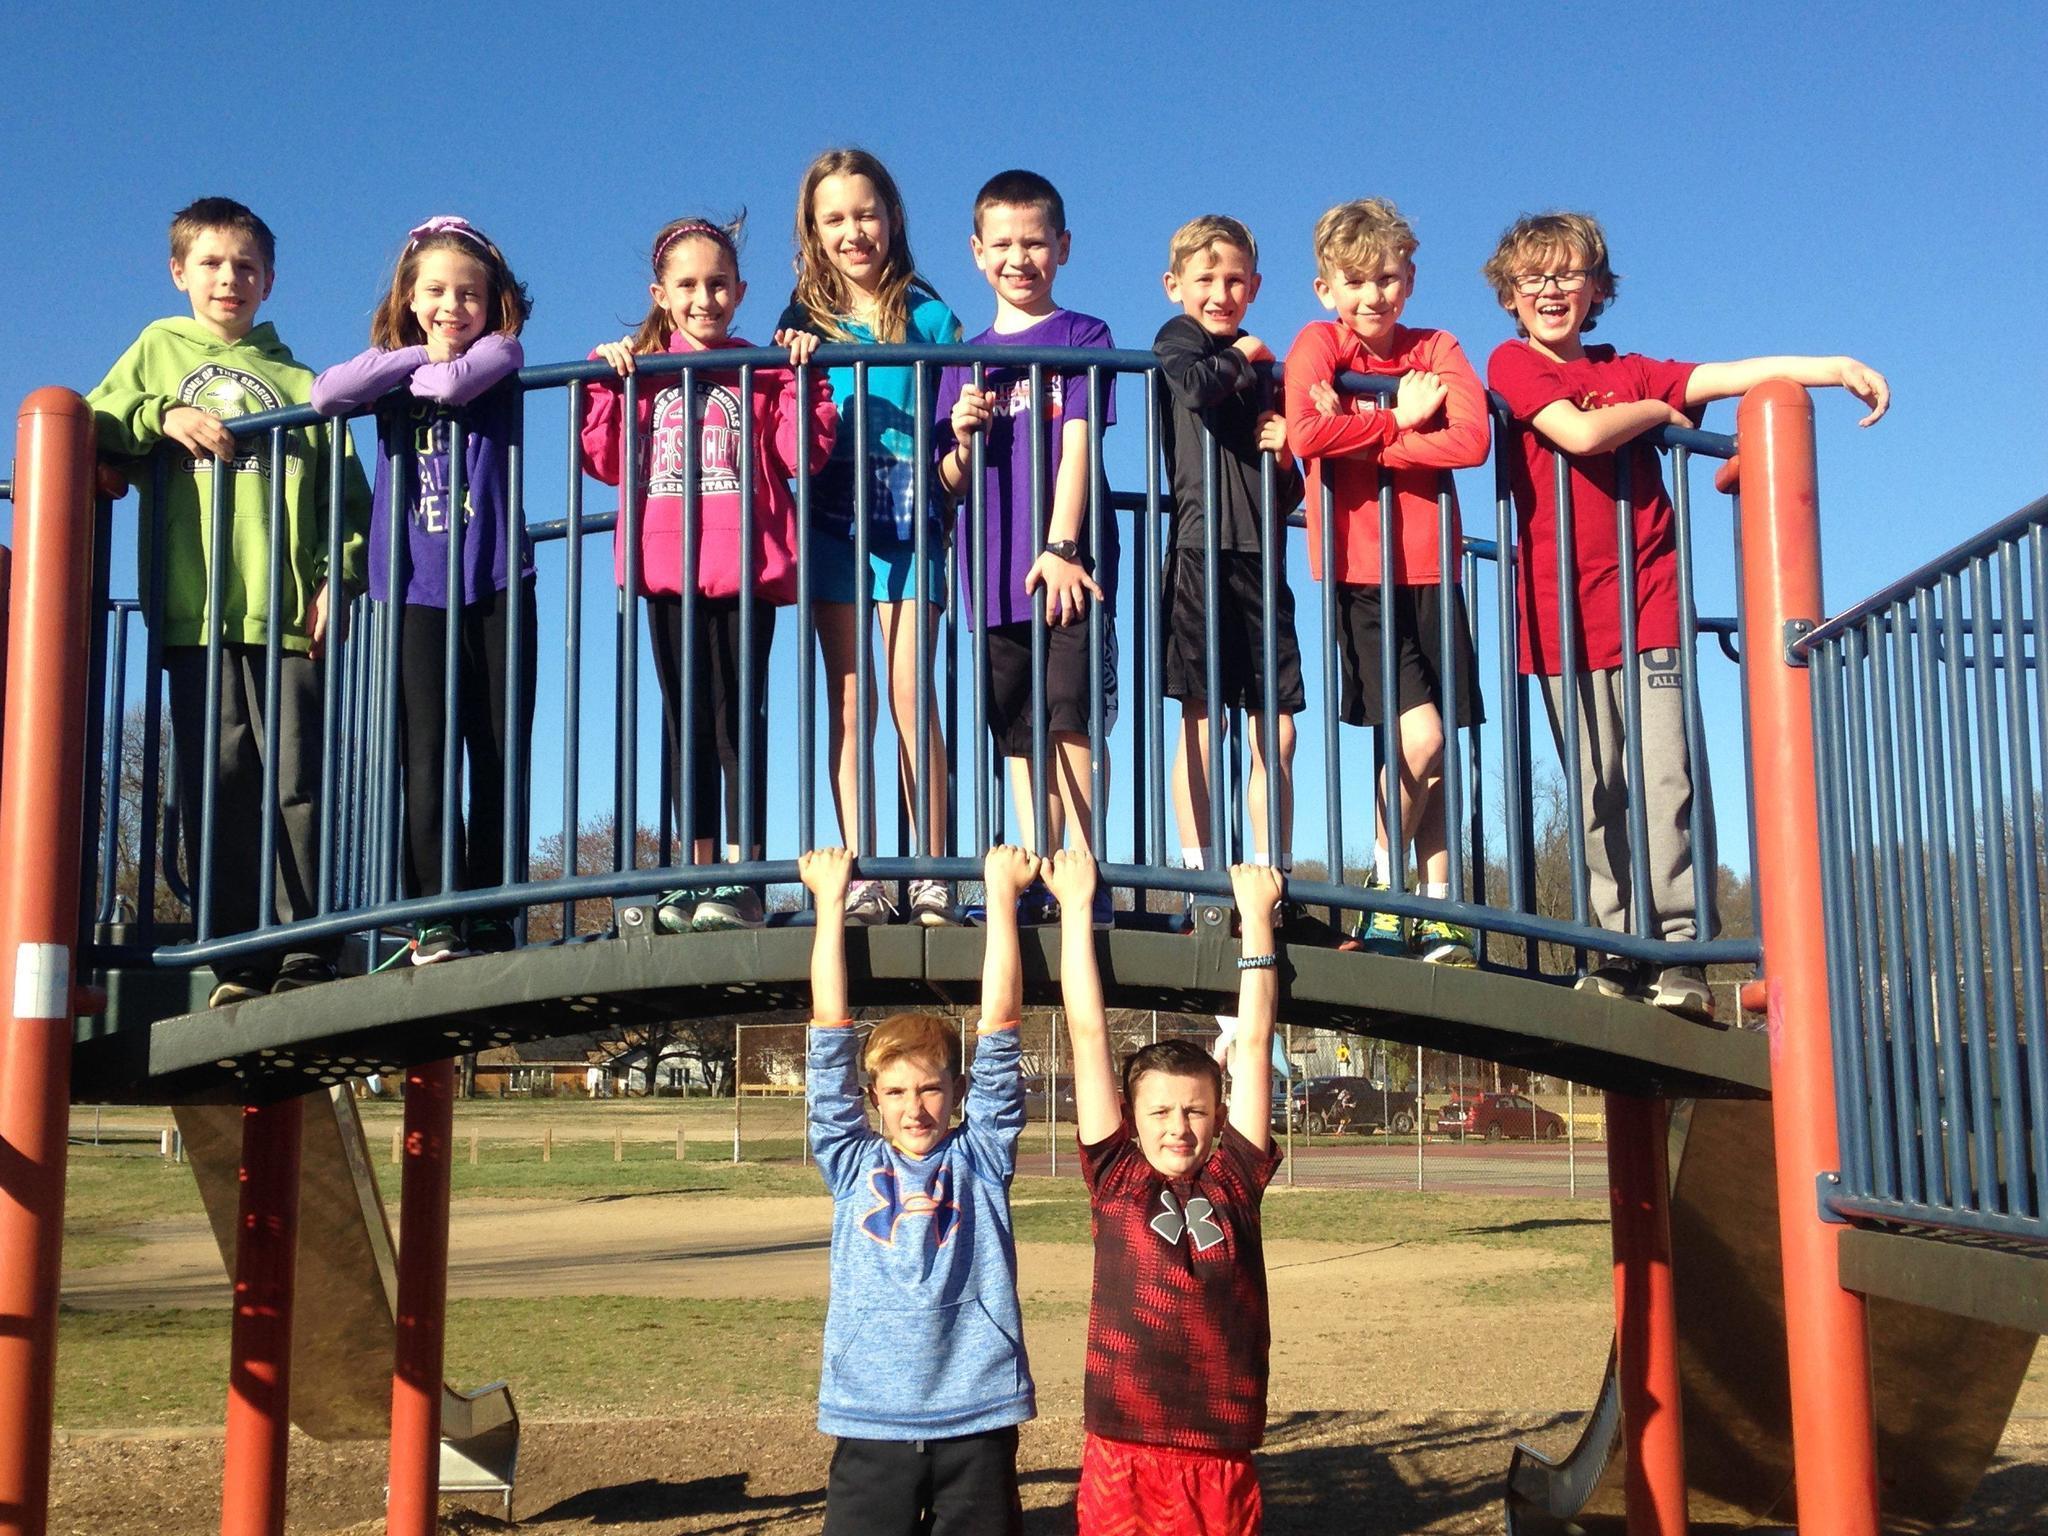 Broadneck Elementary How Many Kids